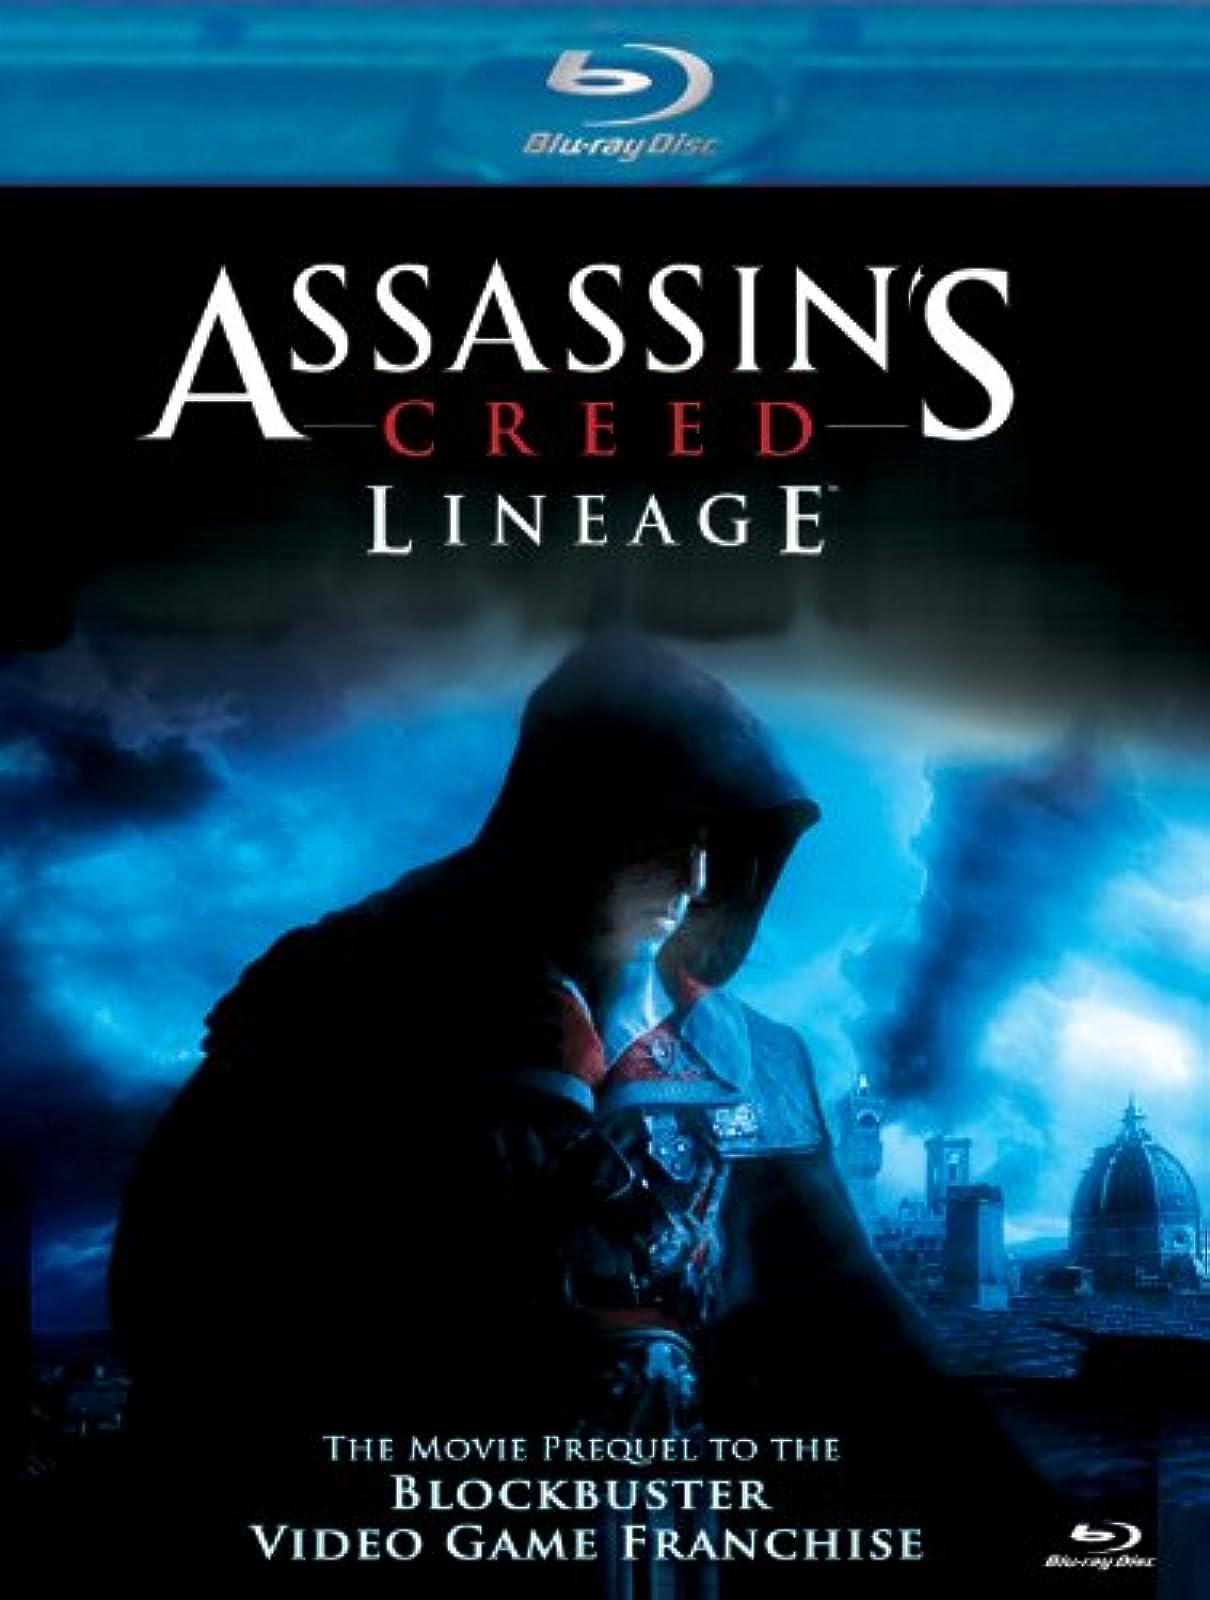 Assassin's Creed: Lineage Blu-Ray On Blu-Ray With Romano Orzari